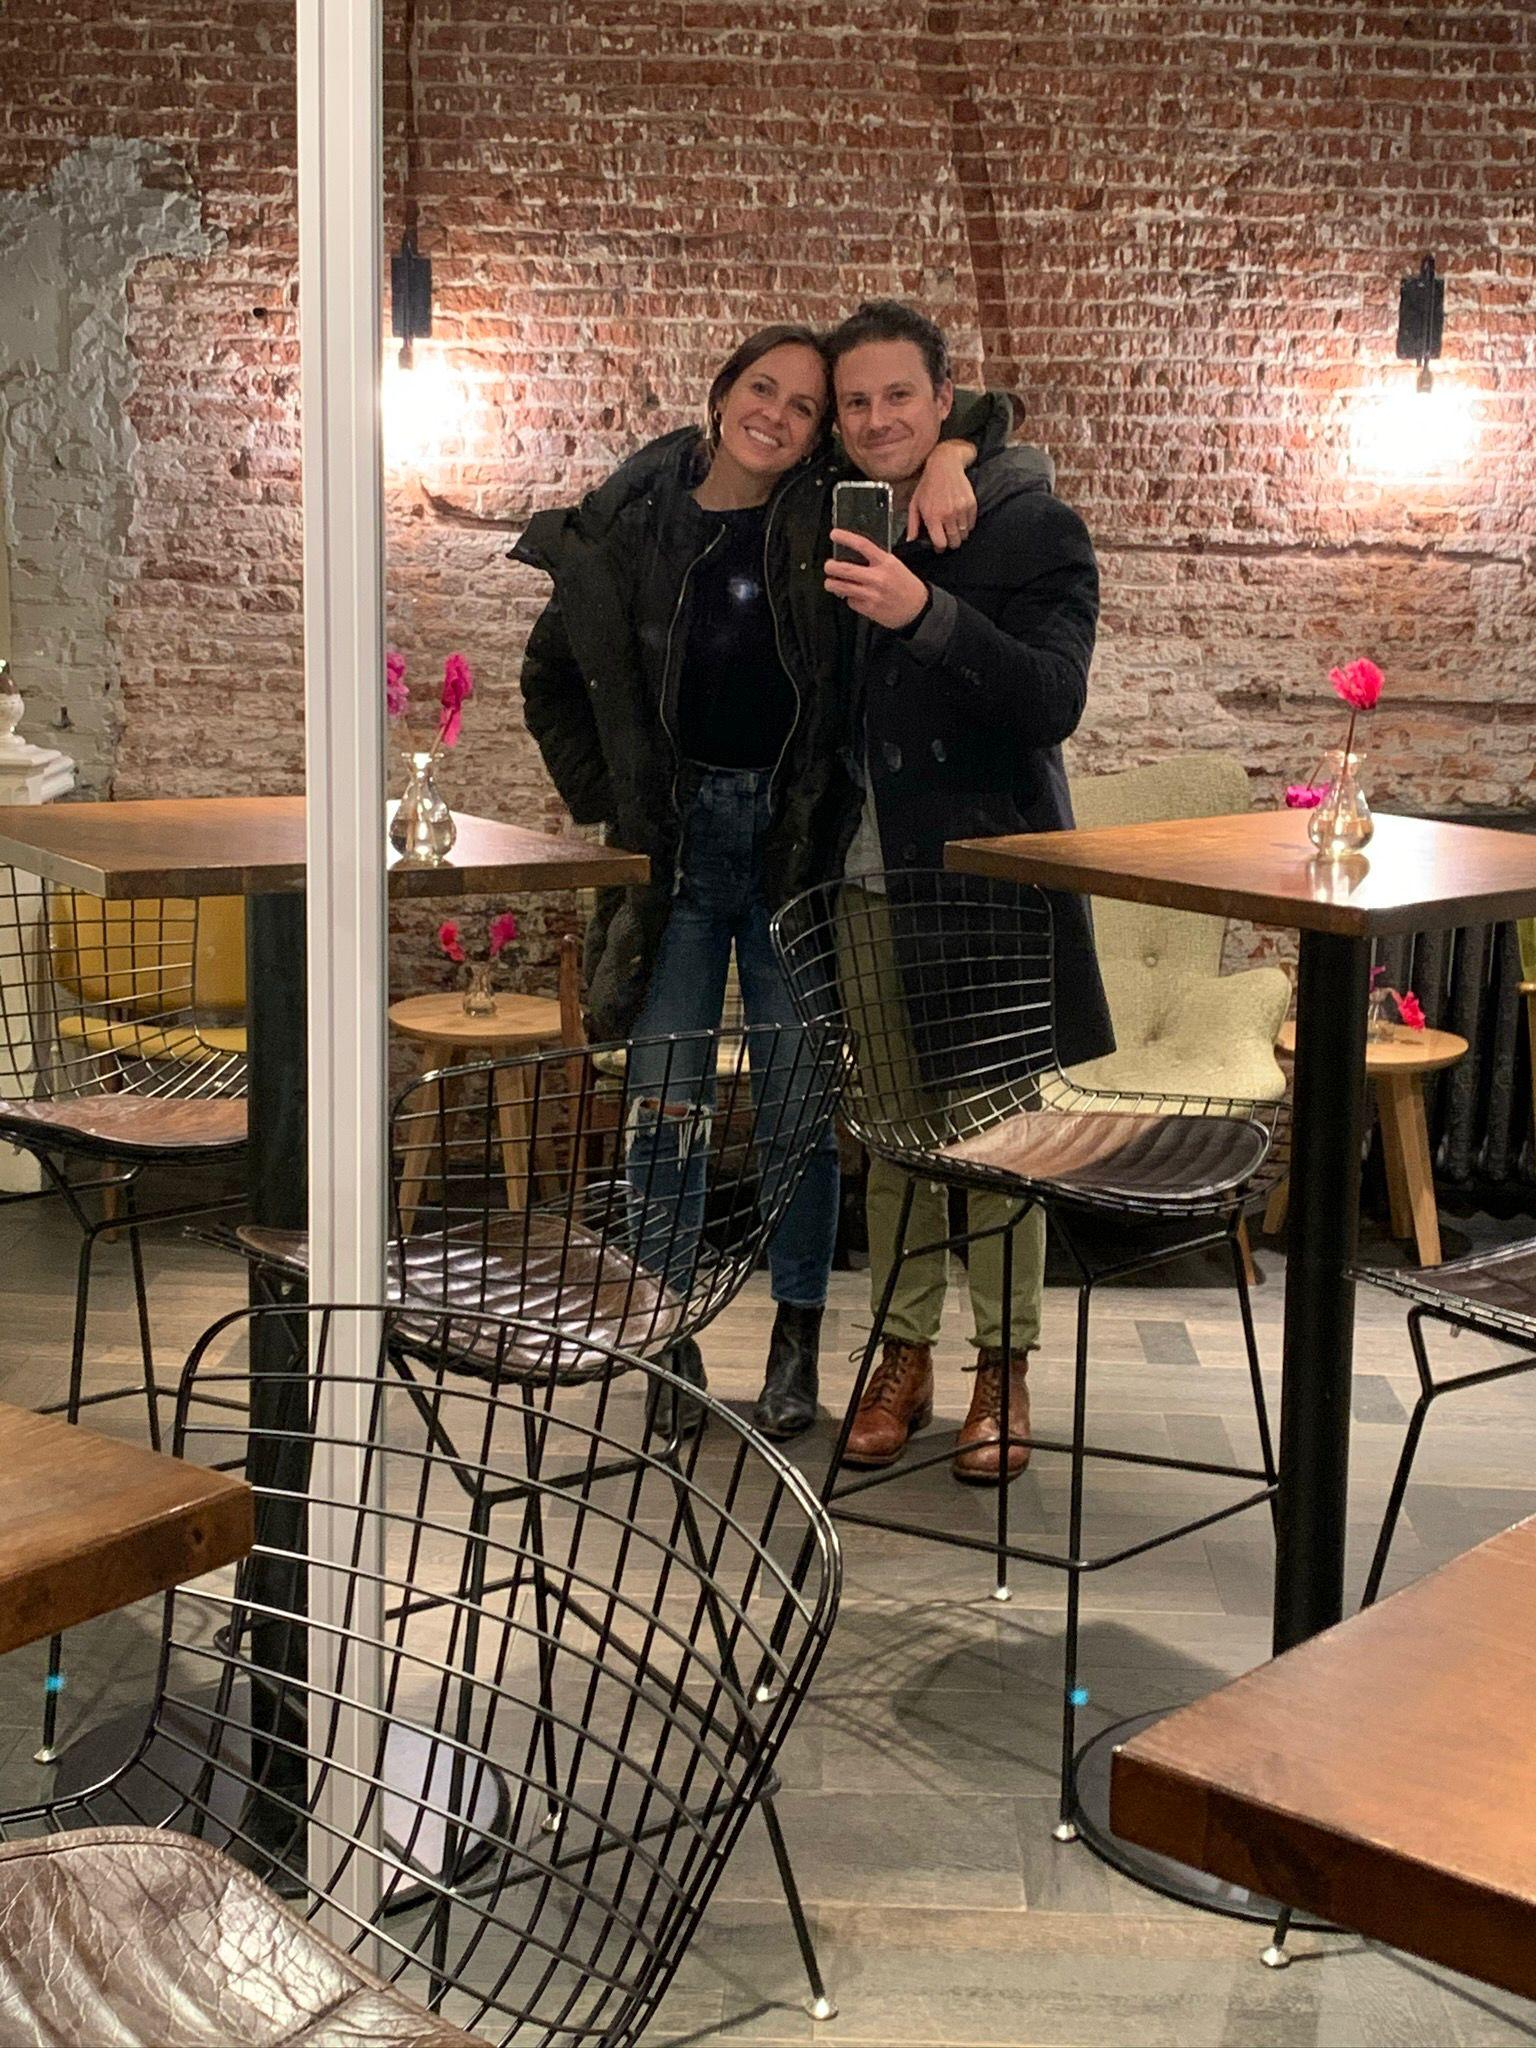 couple mirror selfie